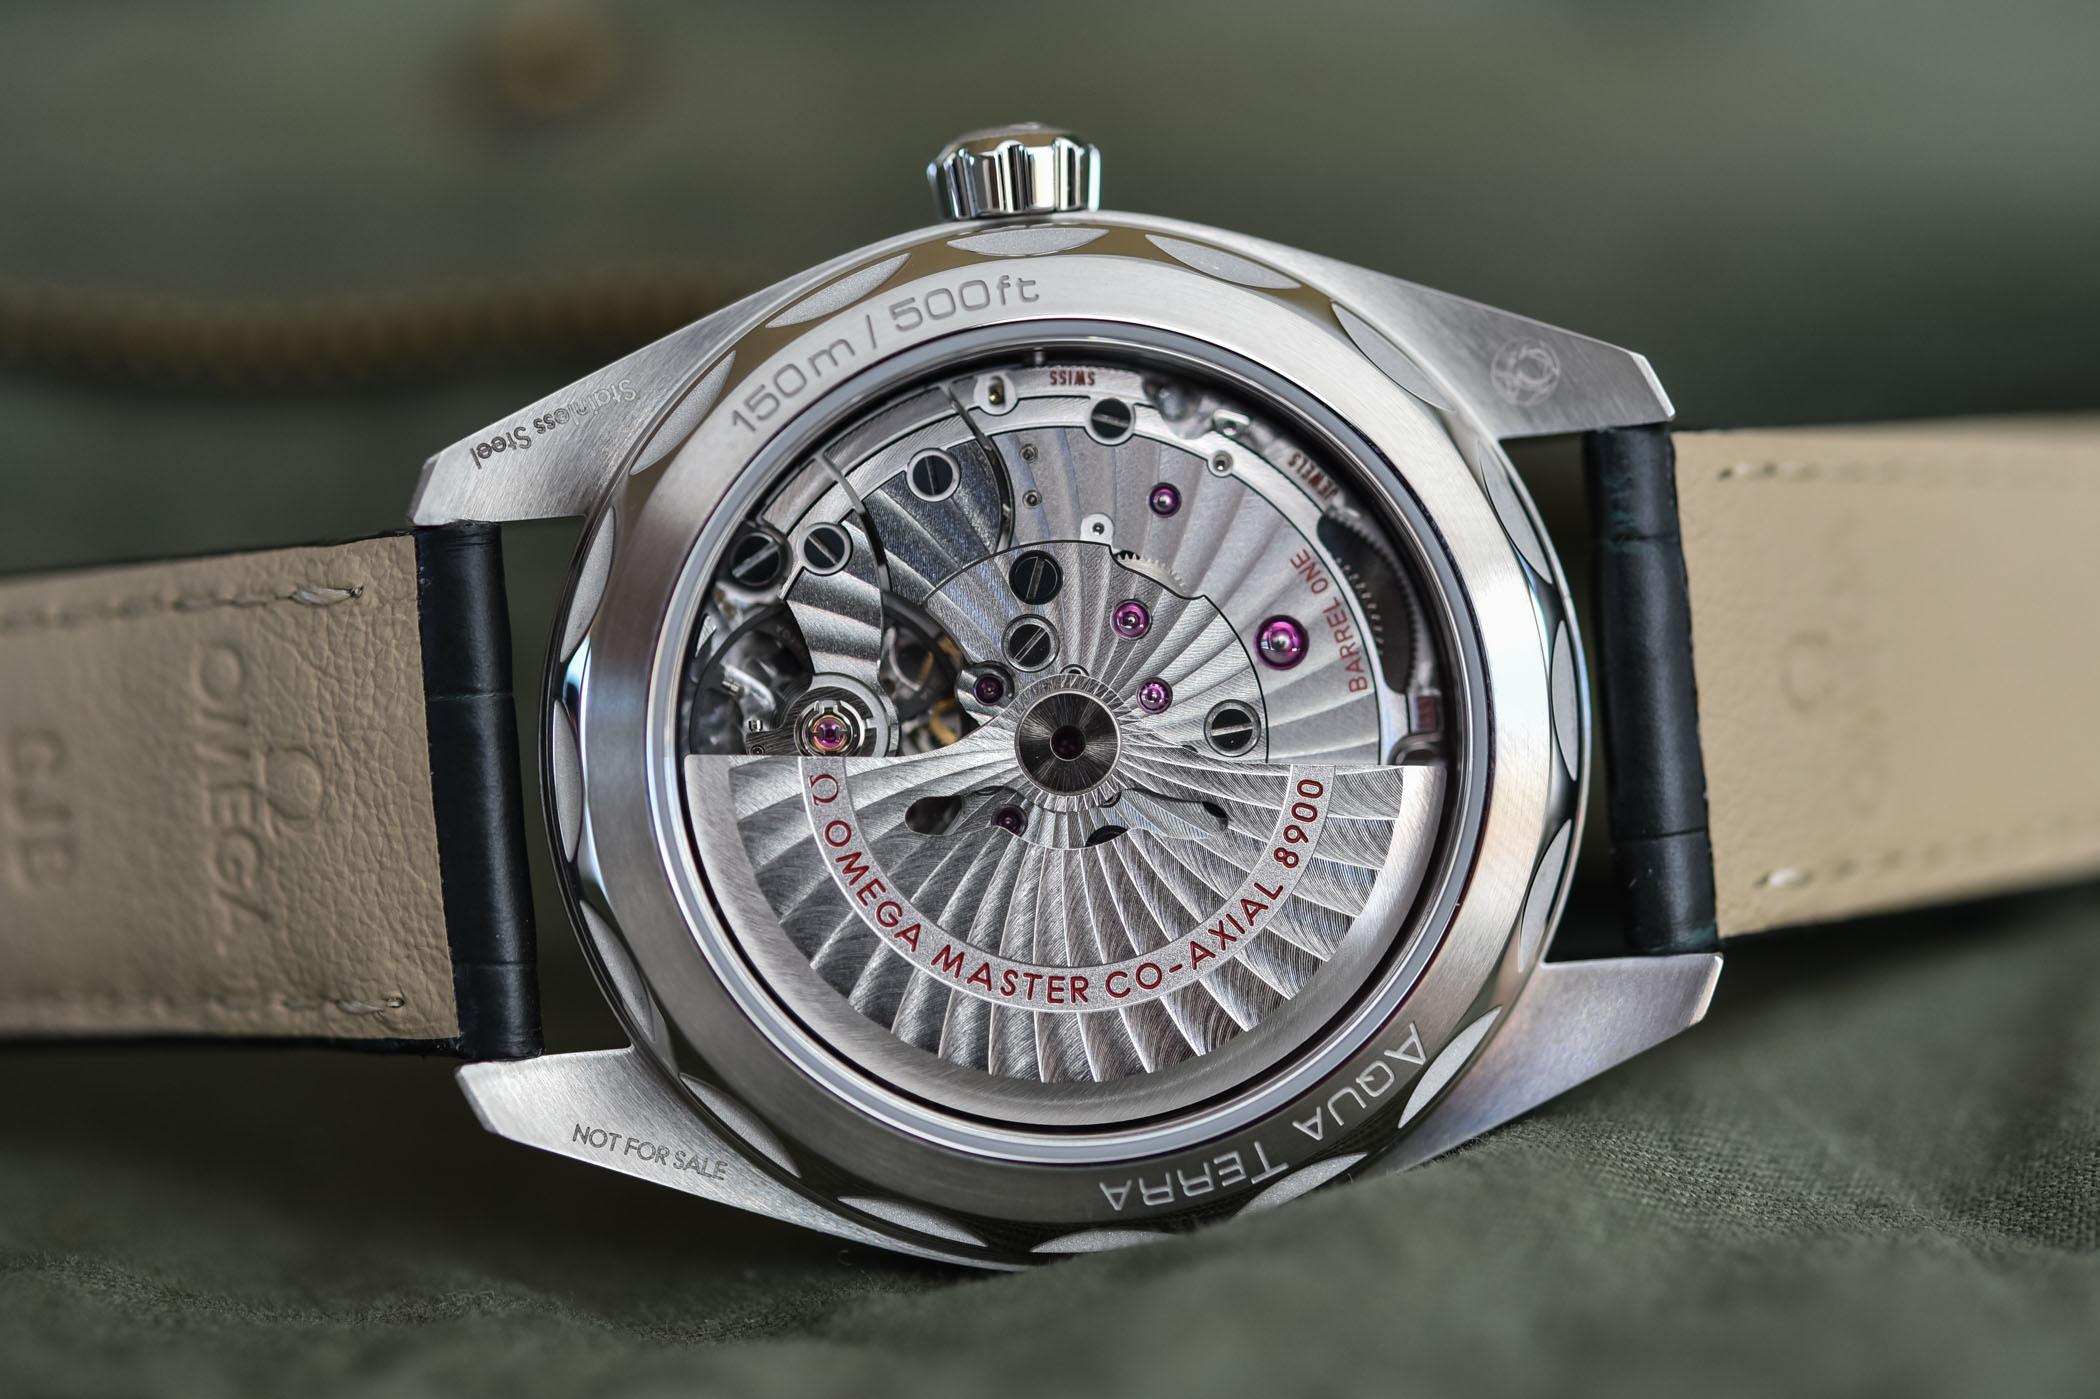 Calibre 8900 del Omega Seamaster Aqua Terra 150M Master Chronometer